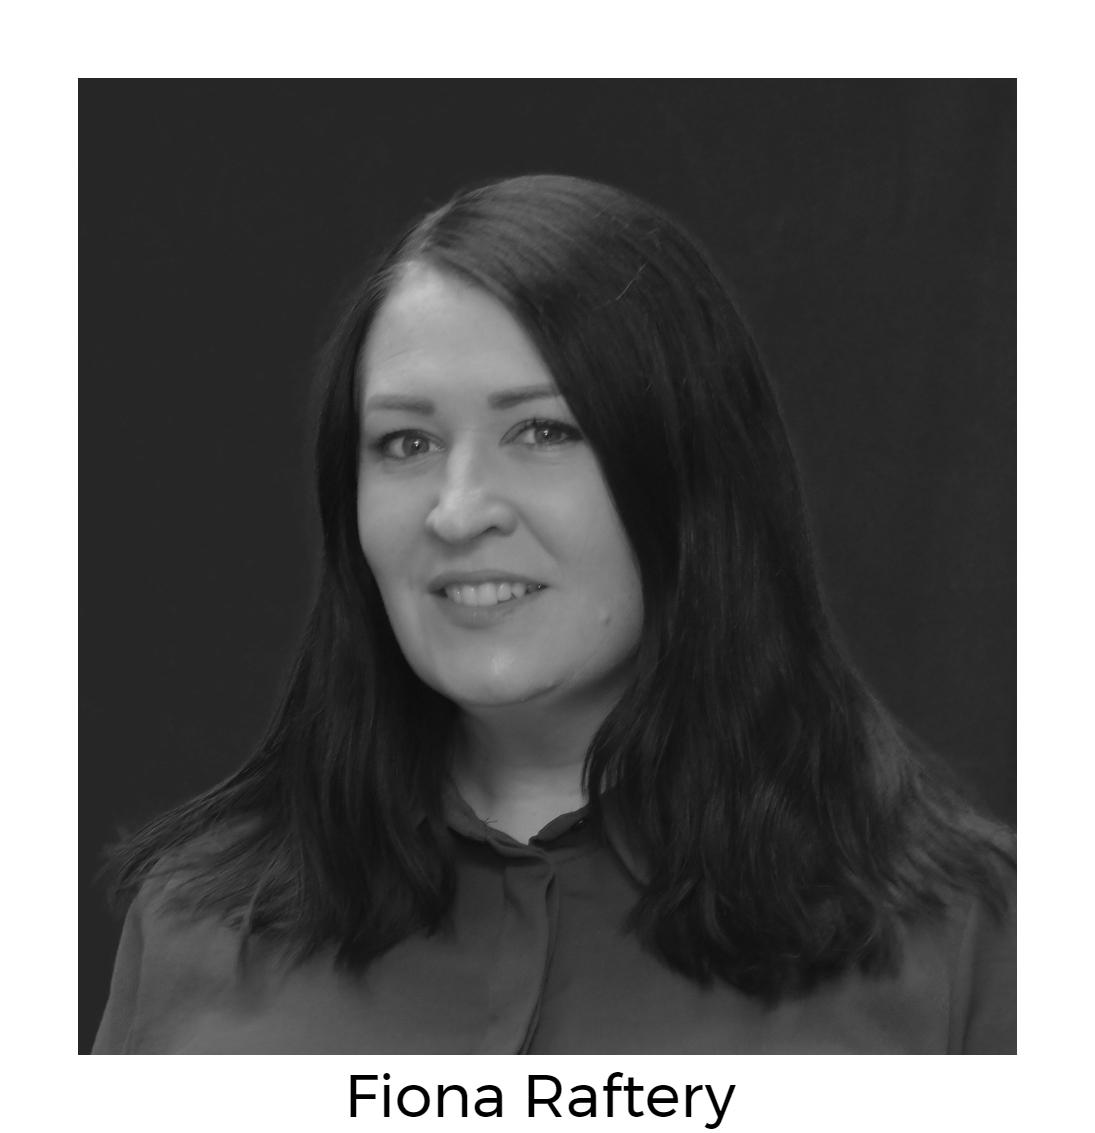 Fiona Raftery